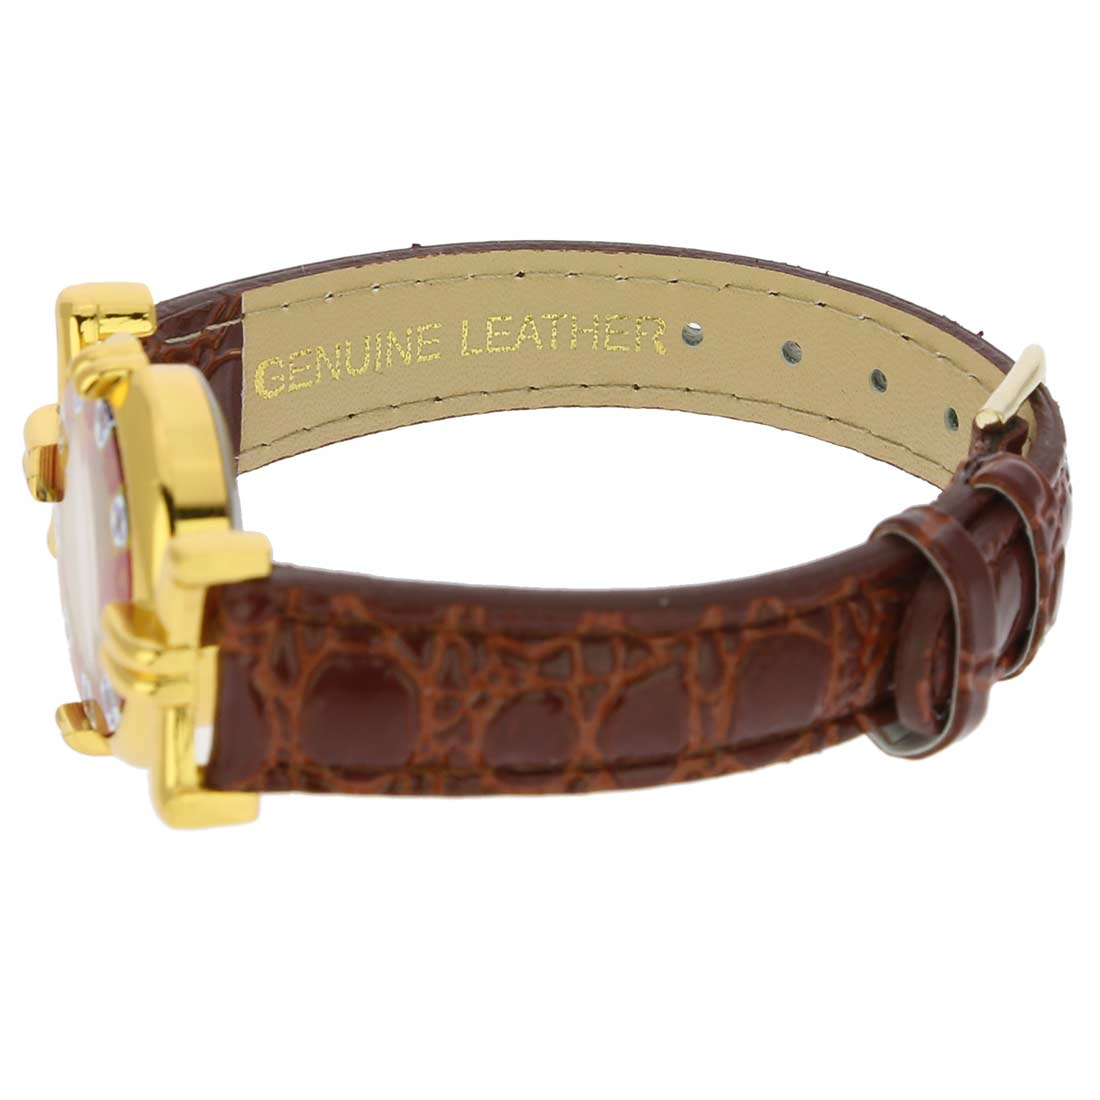 Murano Watches Murano Millefiori Watch With Leather Band